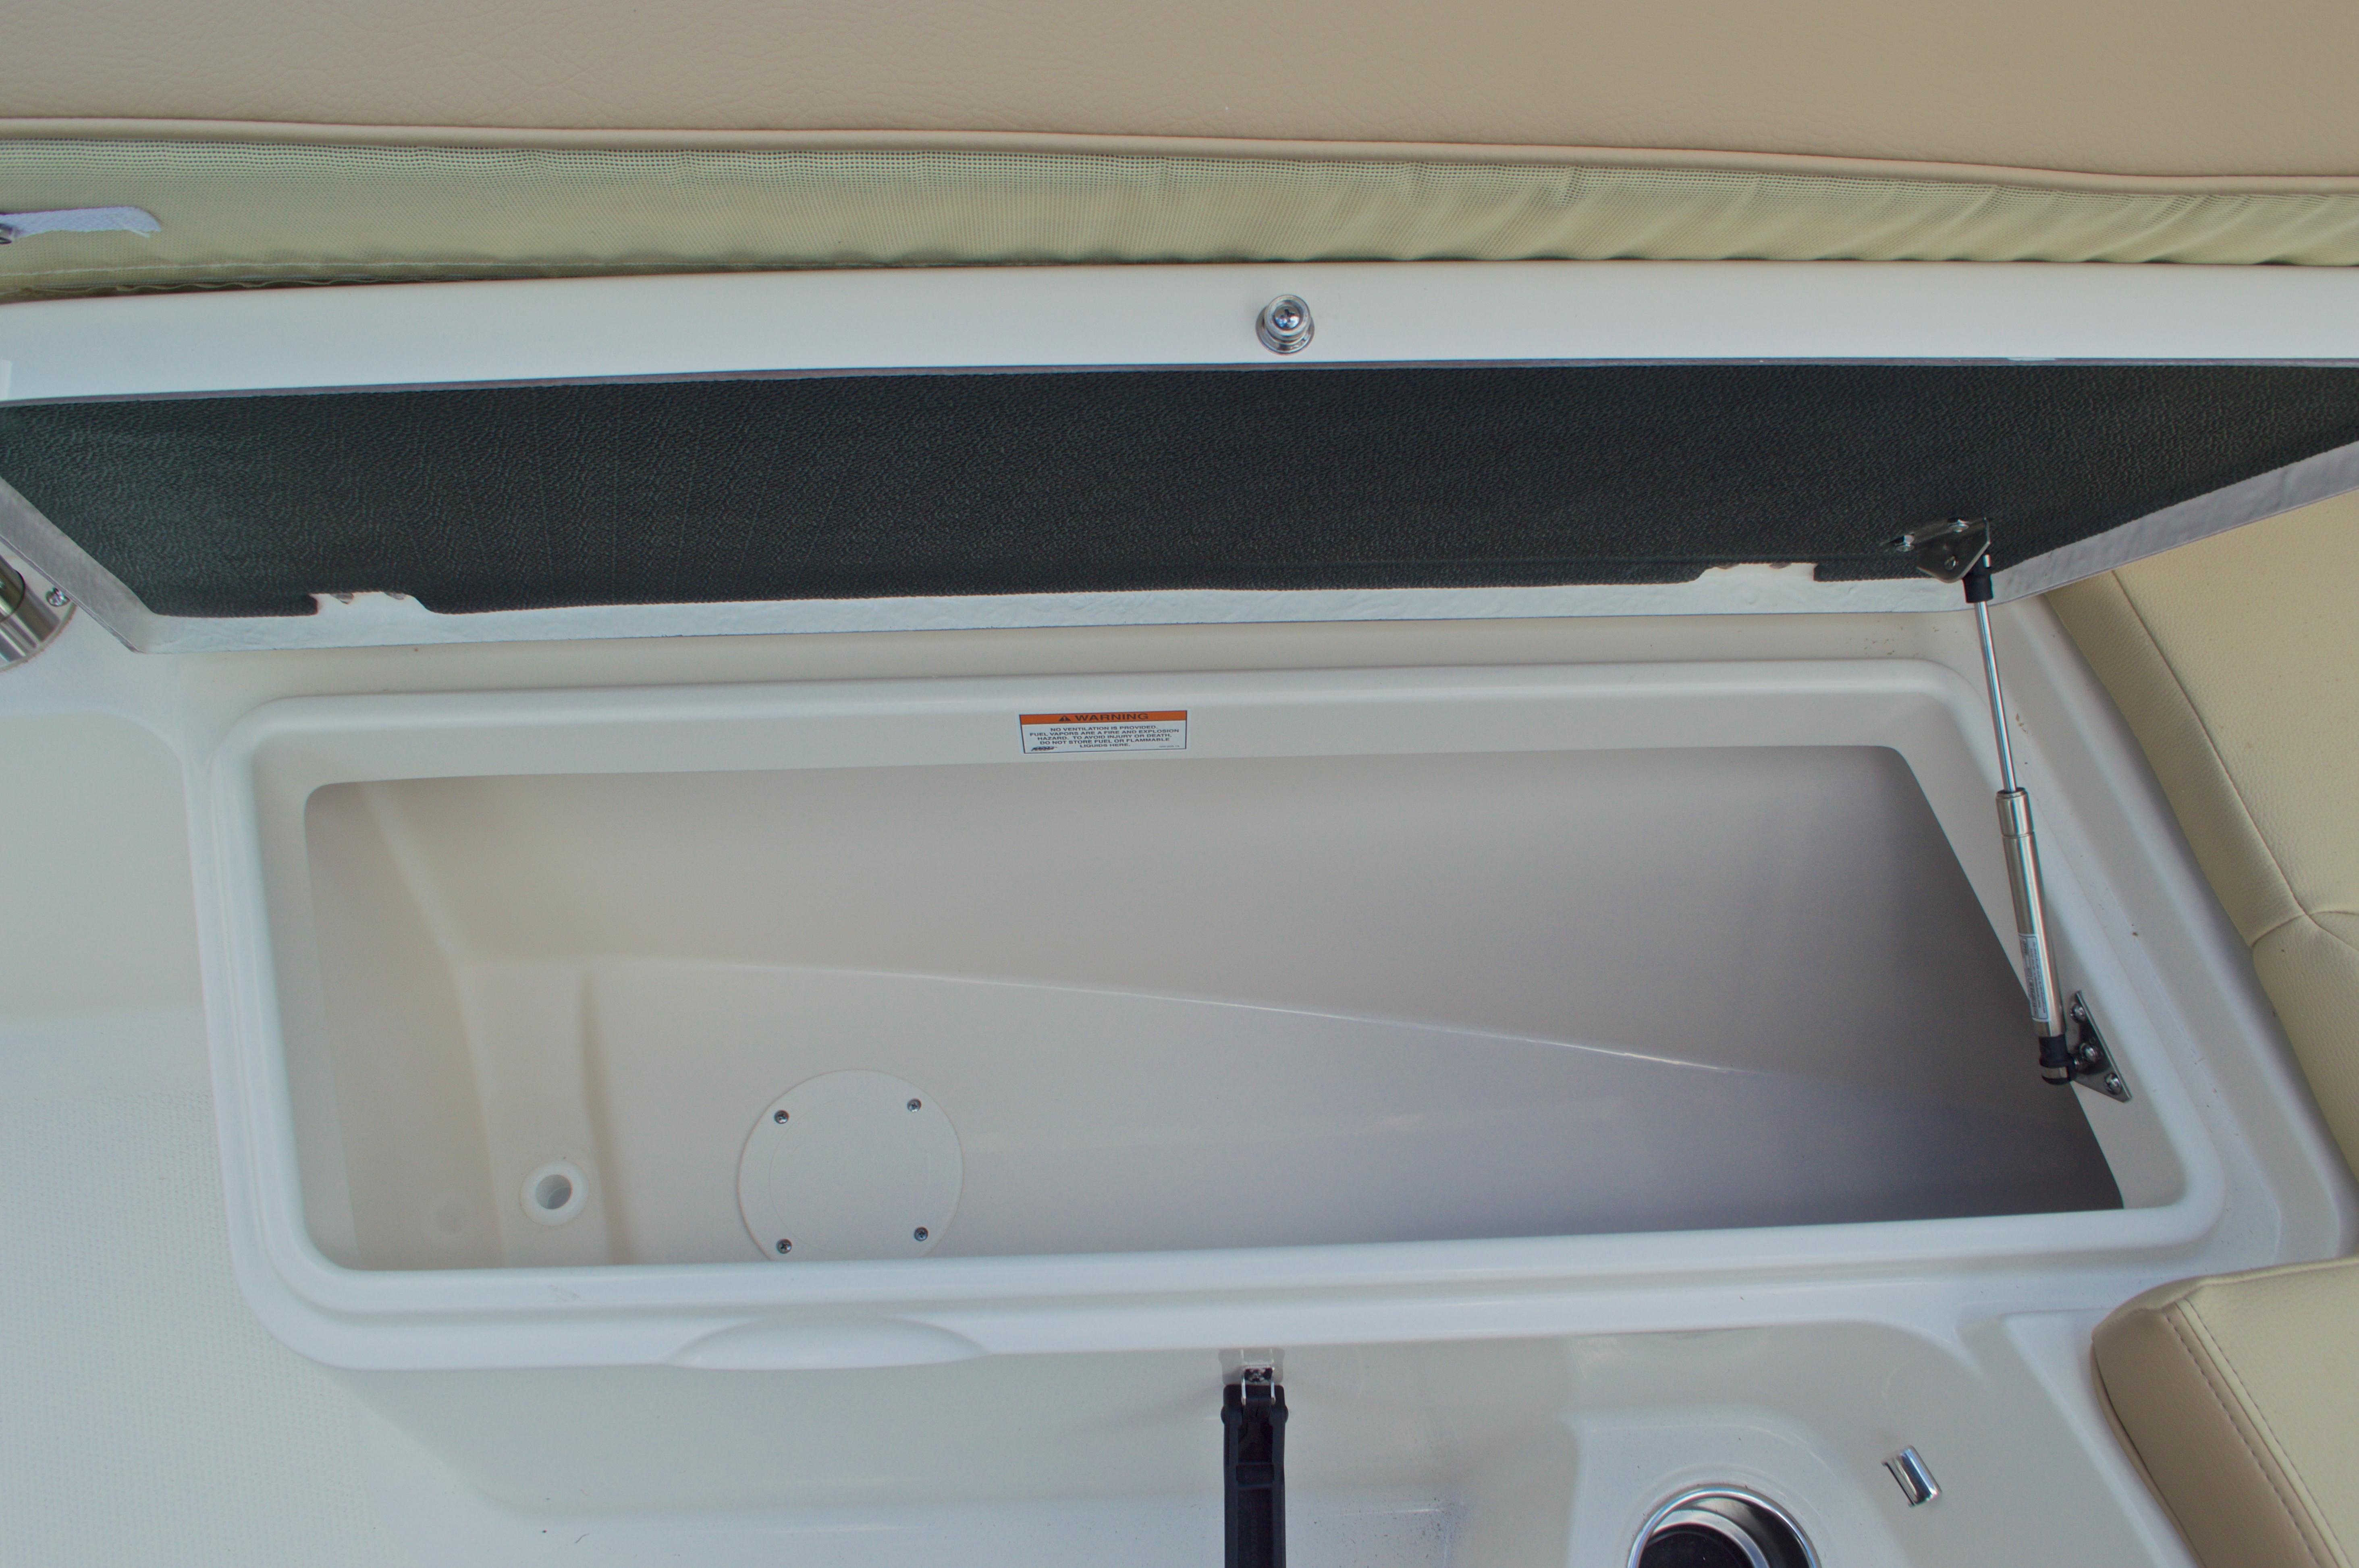 Thumbnail 51 for New 2017 Sailfish 290 CC Center Console boat for sale in Vero Beach, FL